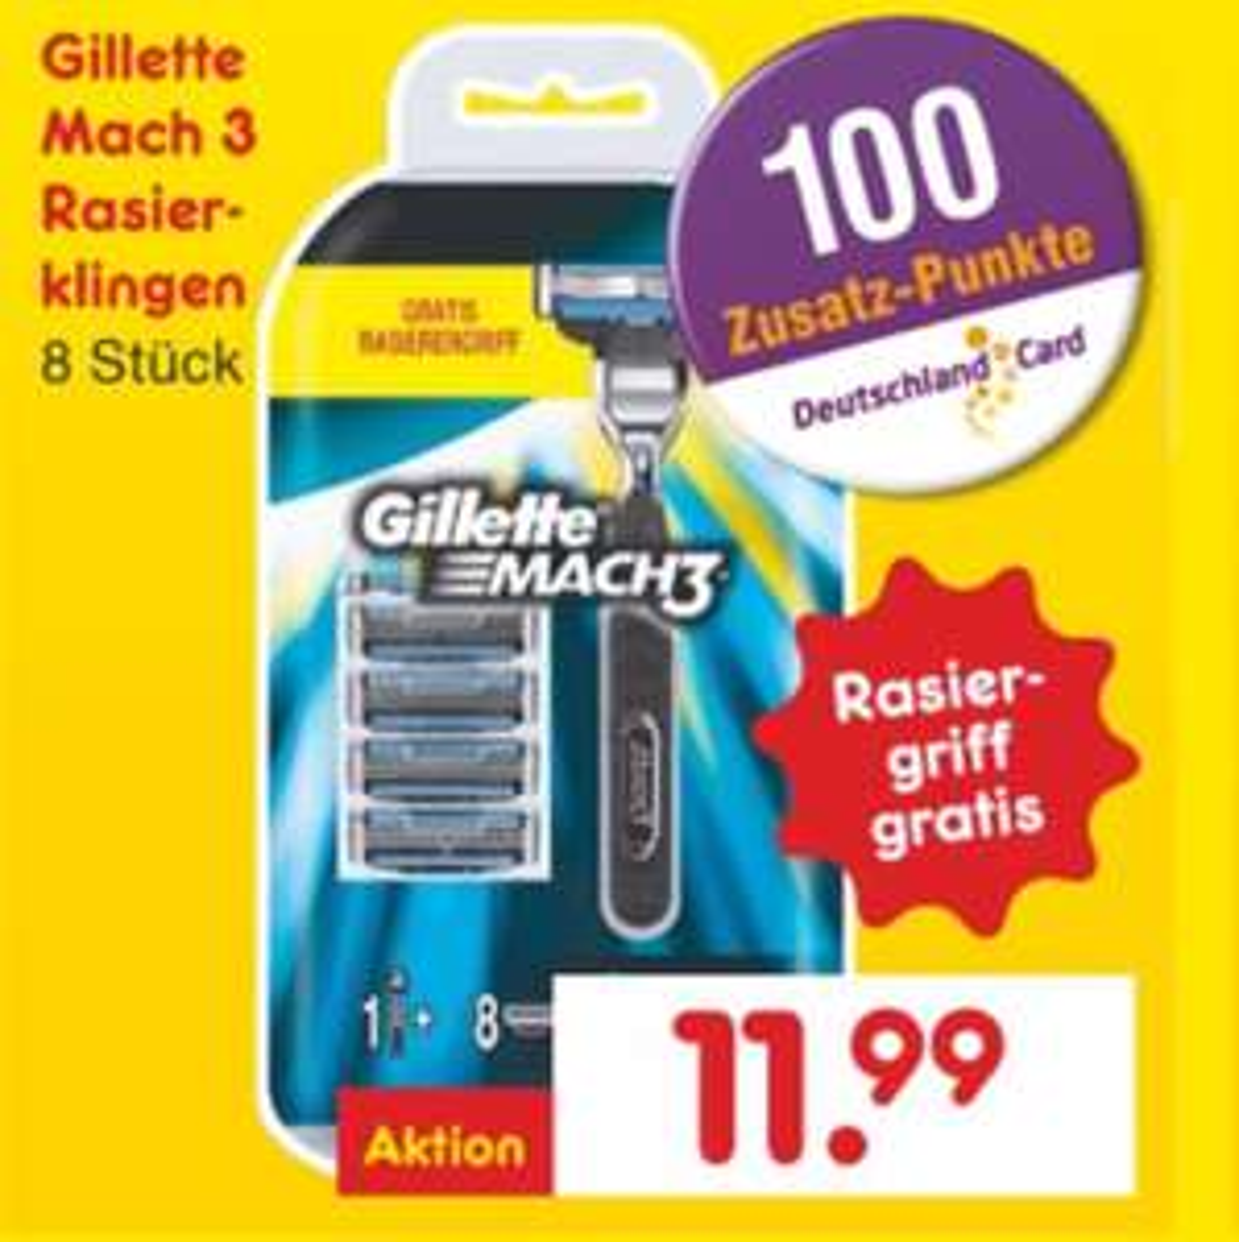 Gillette Mach 3 (1 Rasiergriff + 8 Rasierklingen) [Netto]